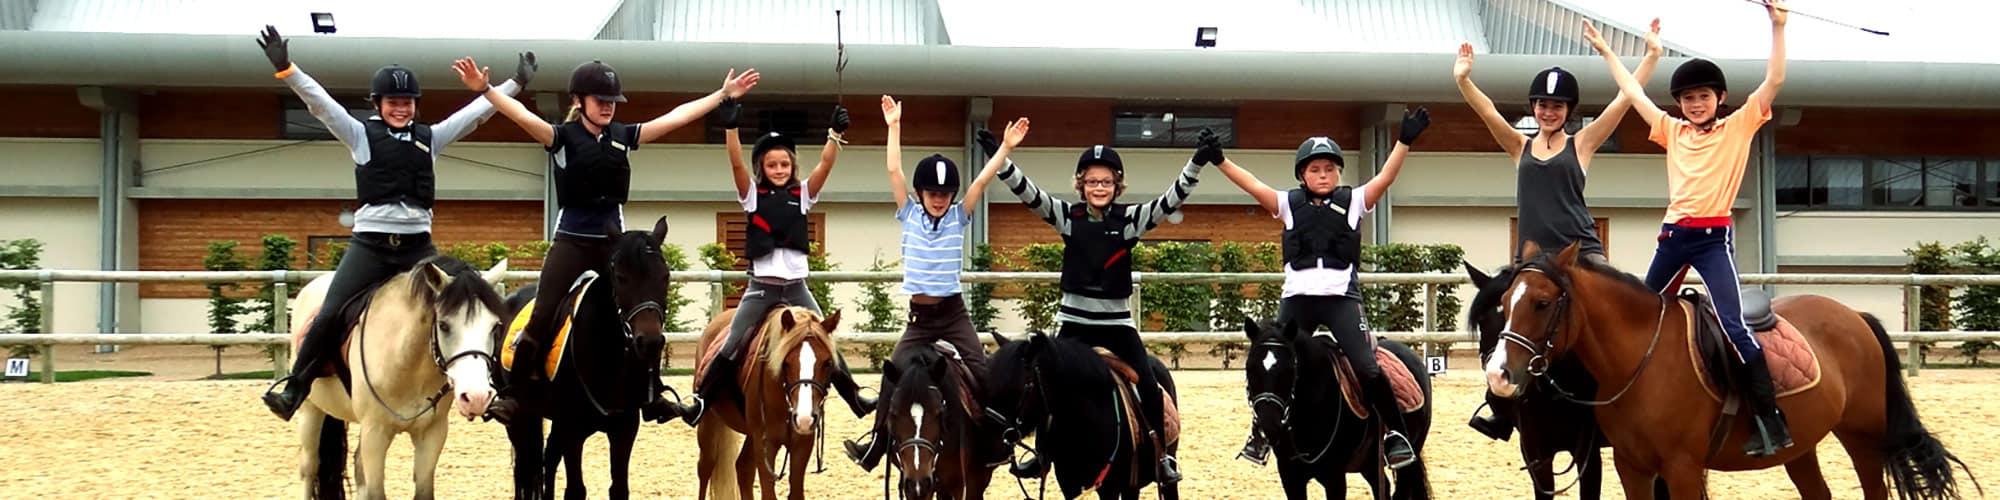 stage-ecole-pole-international-du-cheval-2000-500